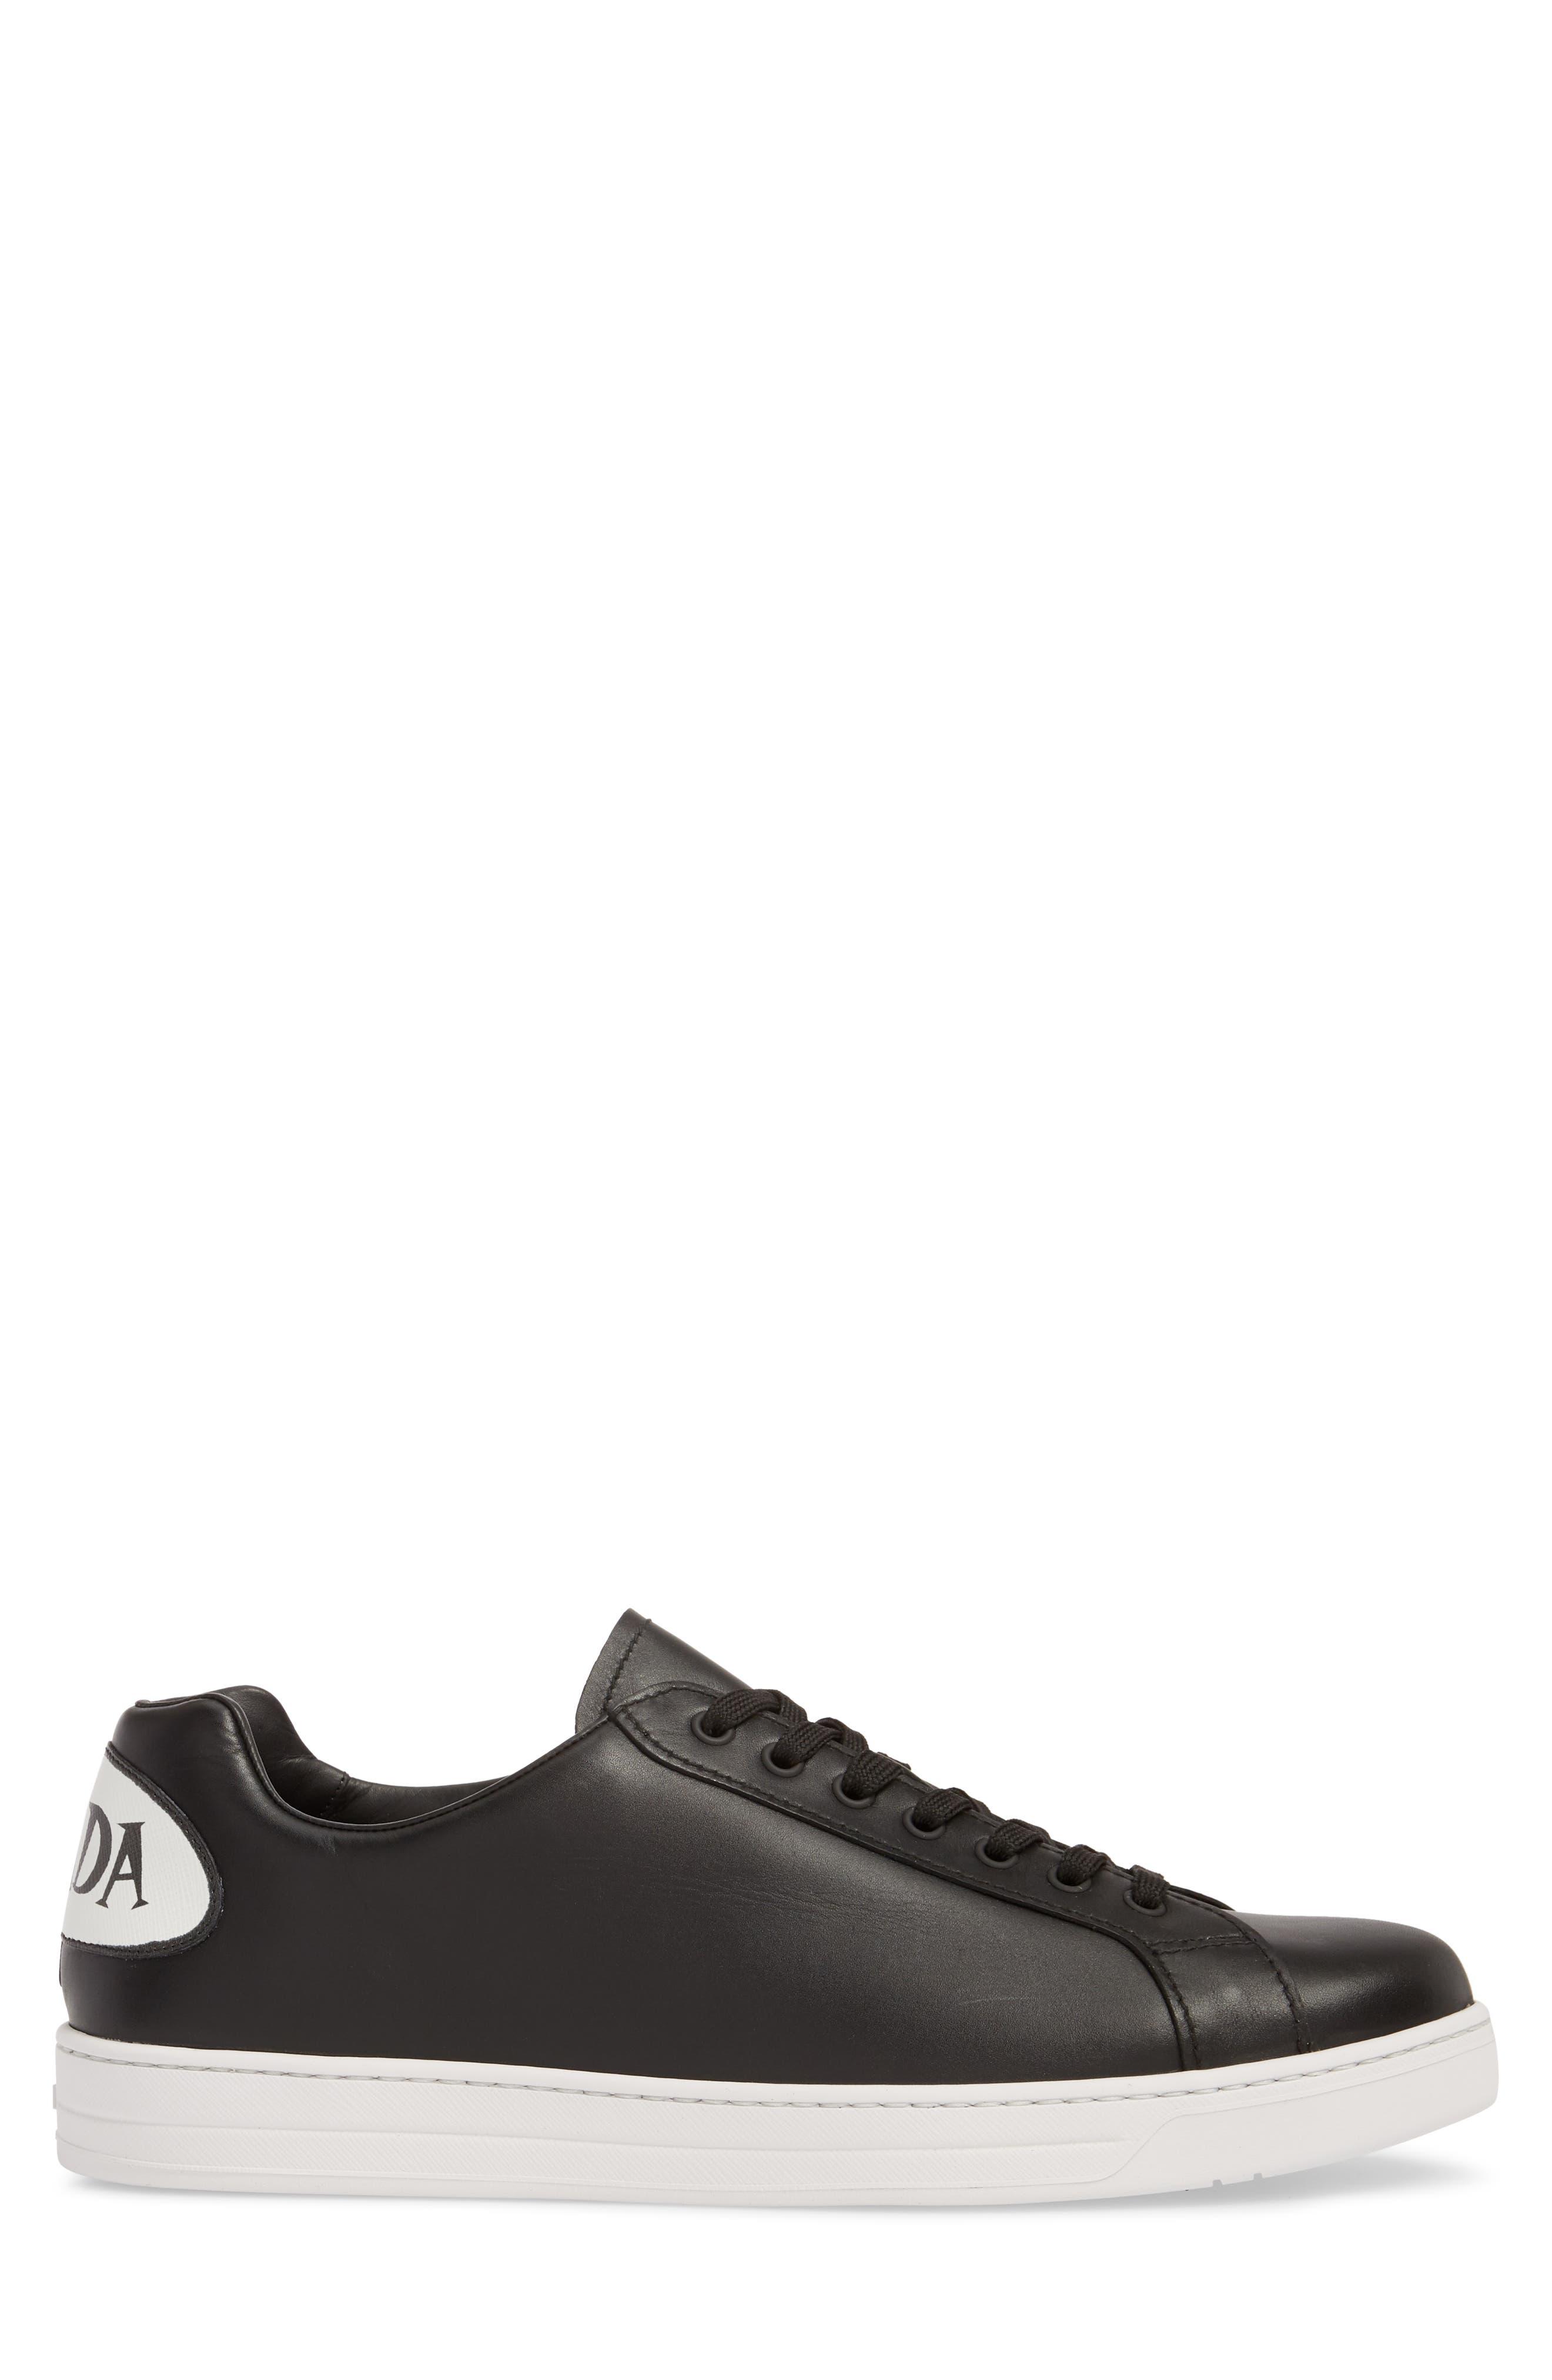 PRADA LINEA ROSSA,                             Patch Low Top Sneaker,                             Alternate thumbnail 3, color,                             012